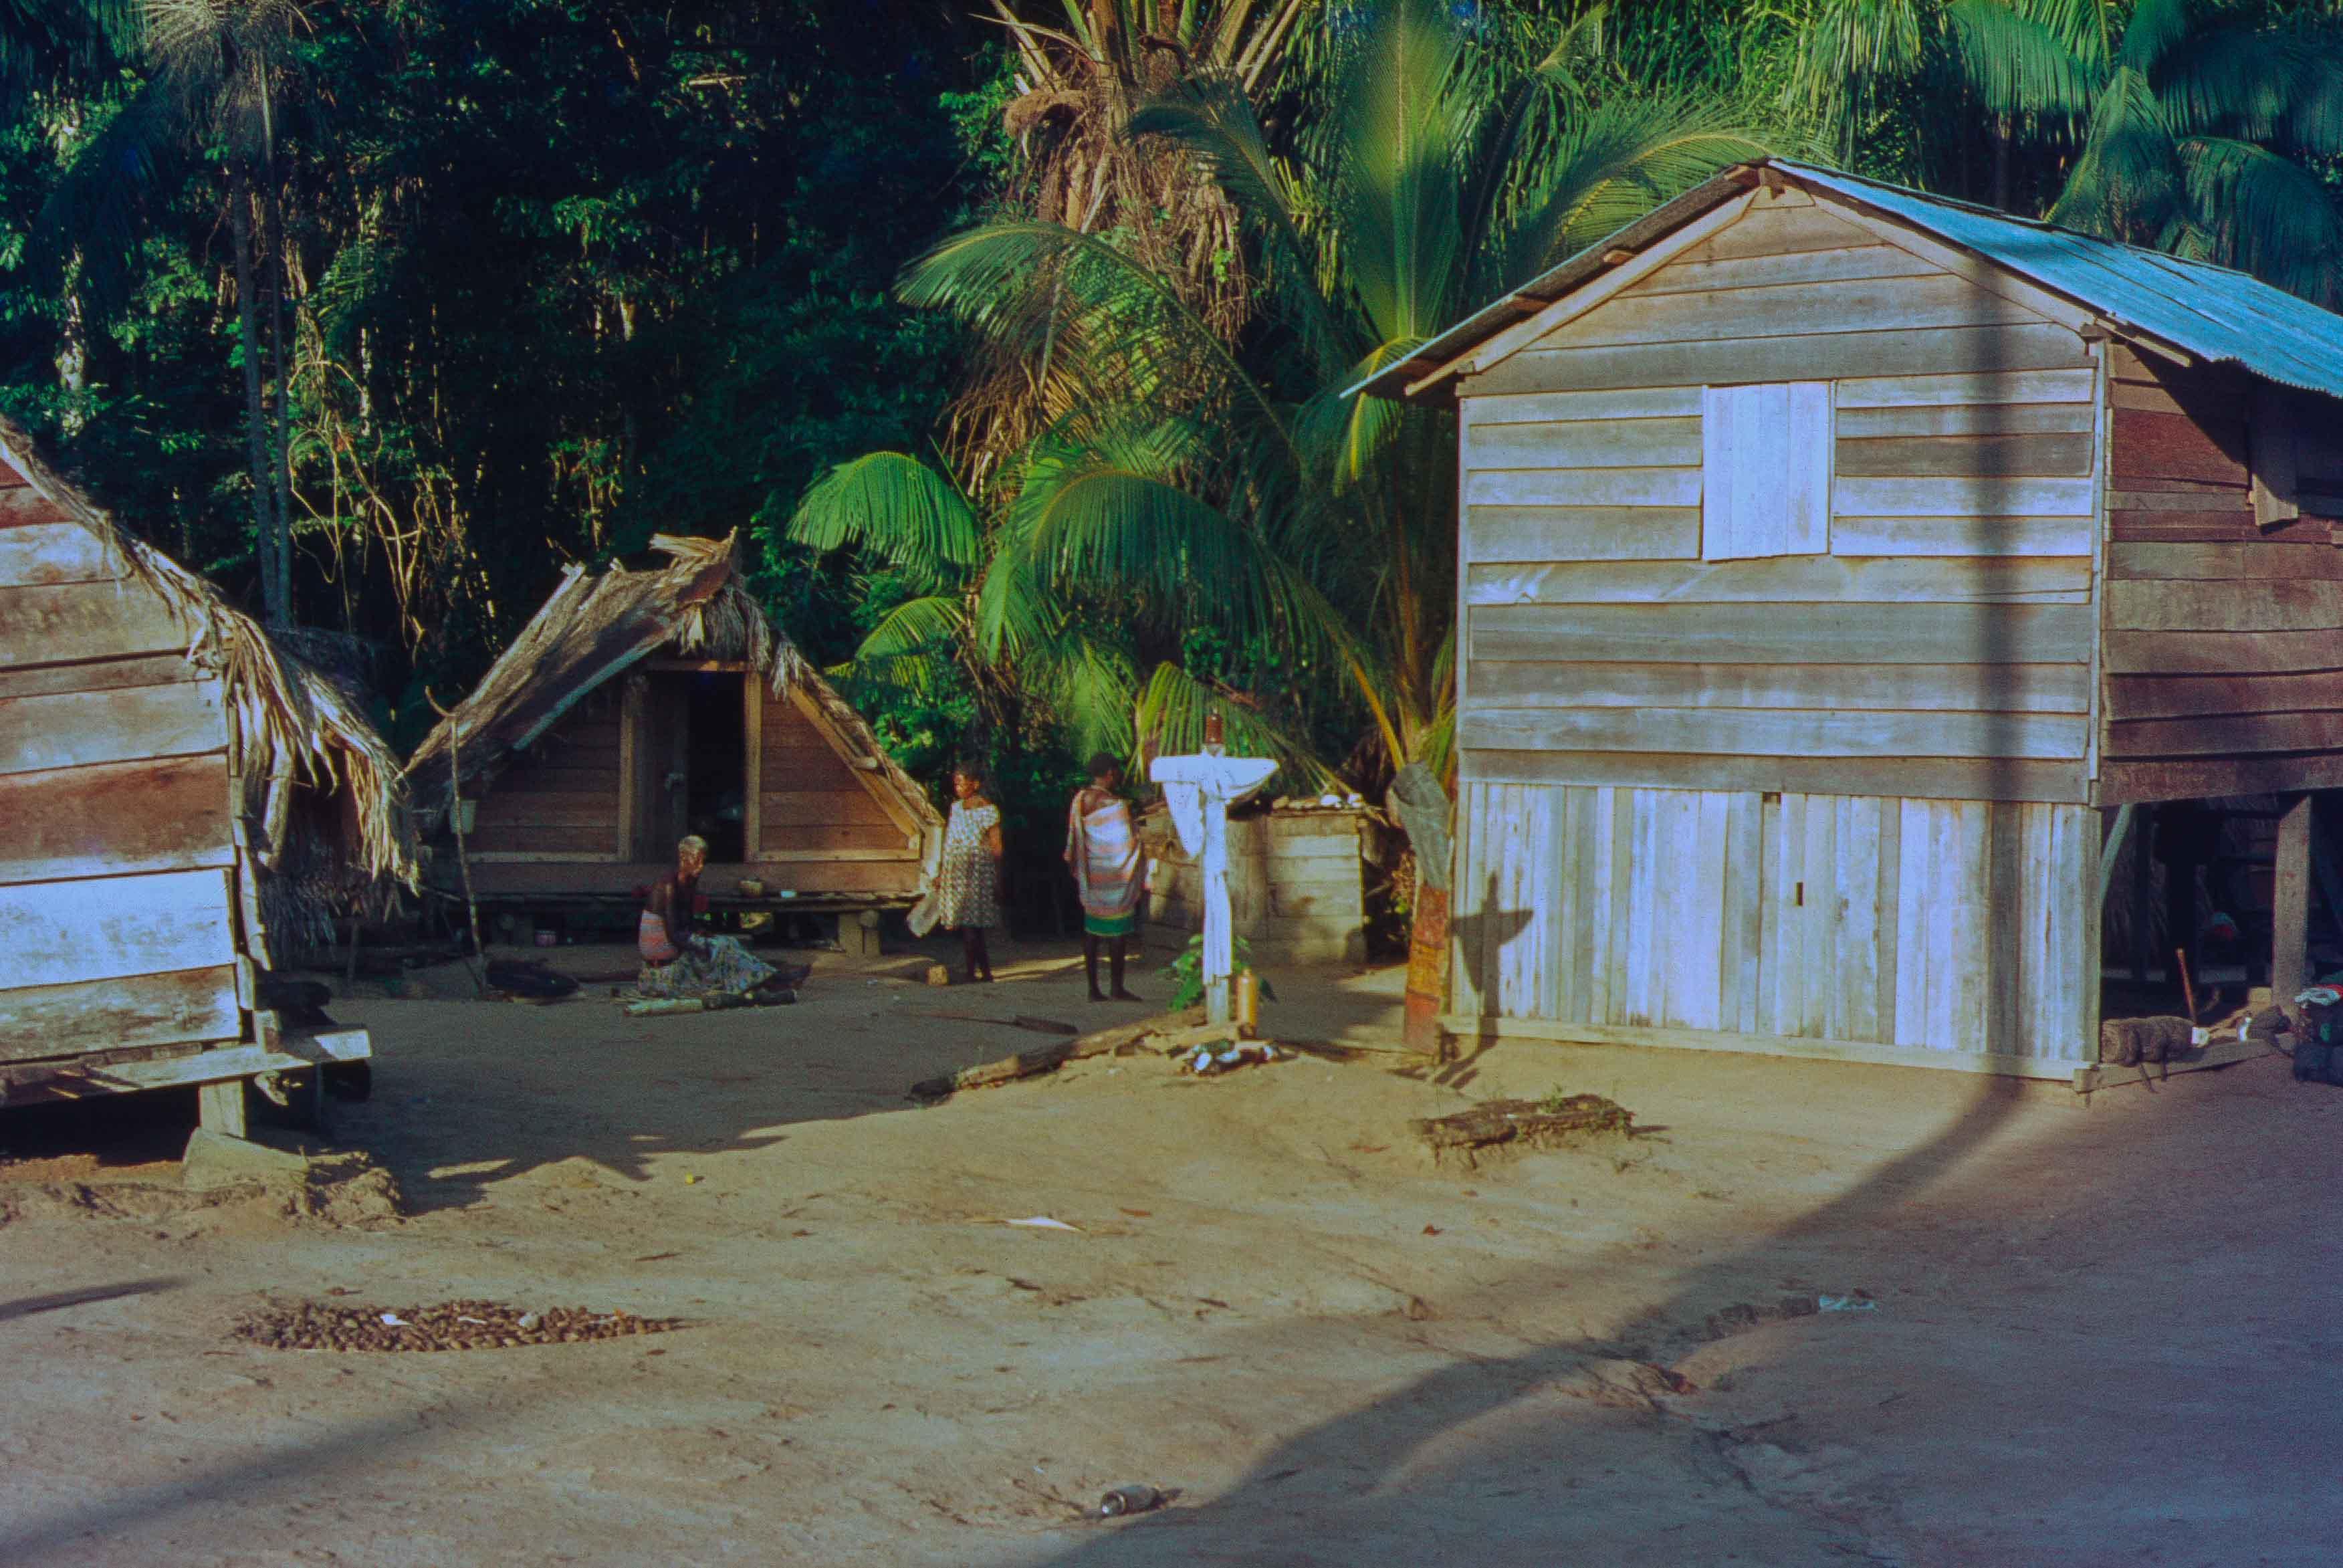 418. Suriname